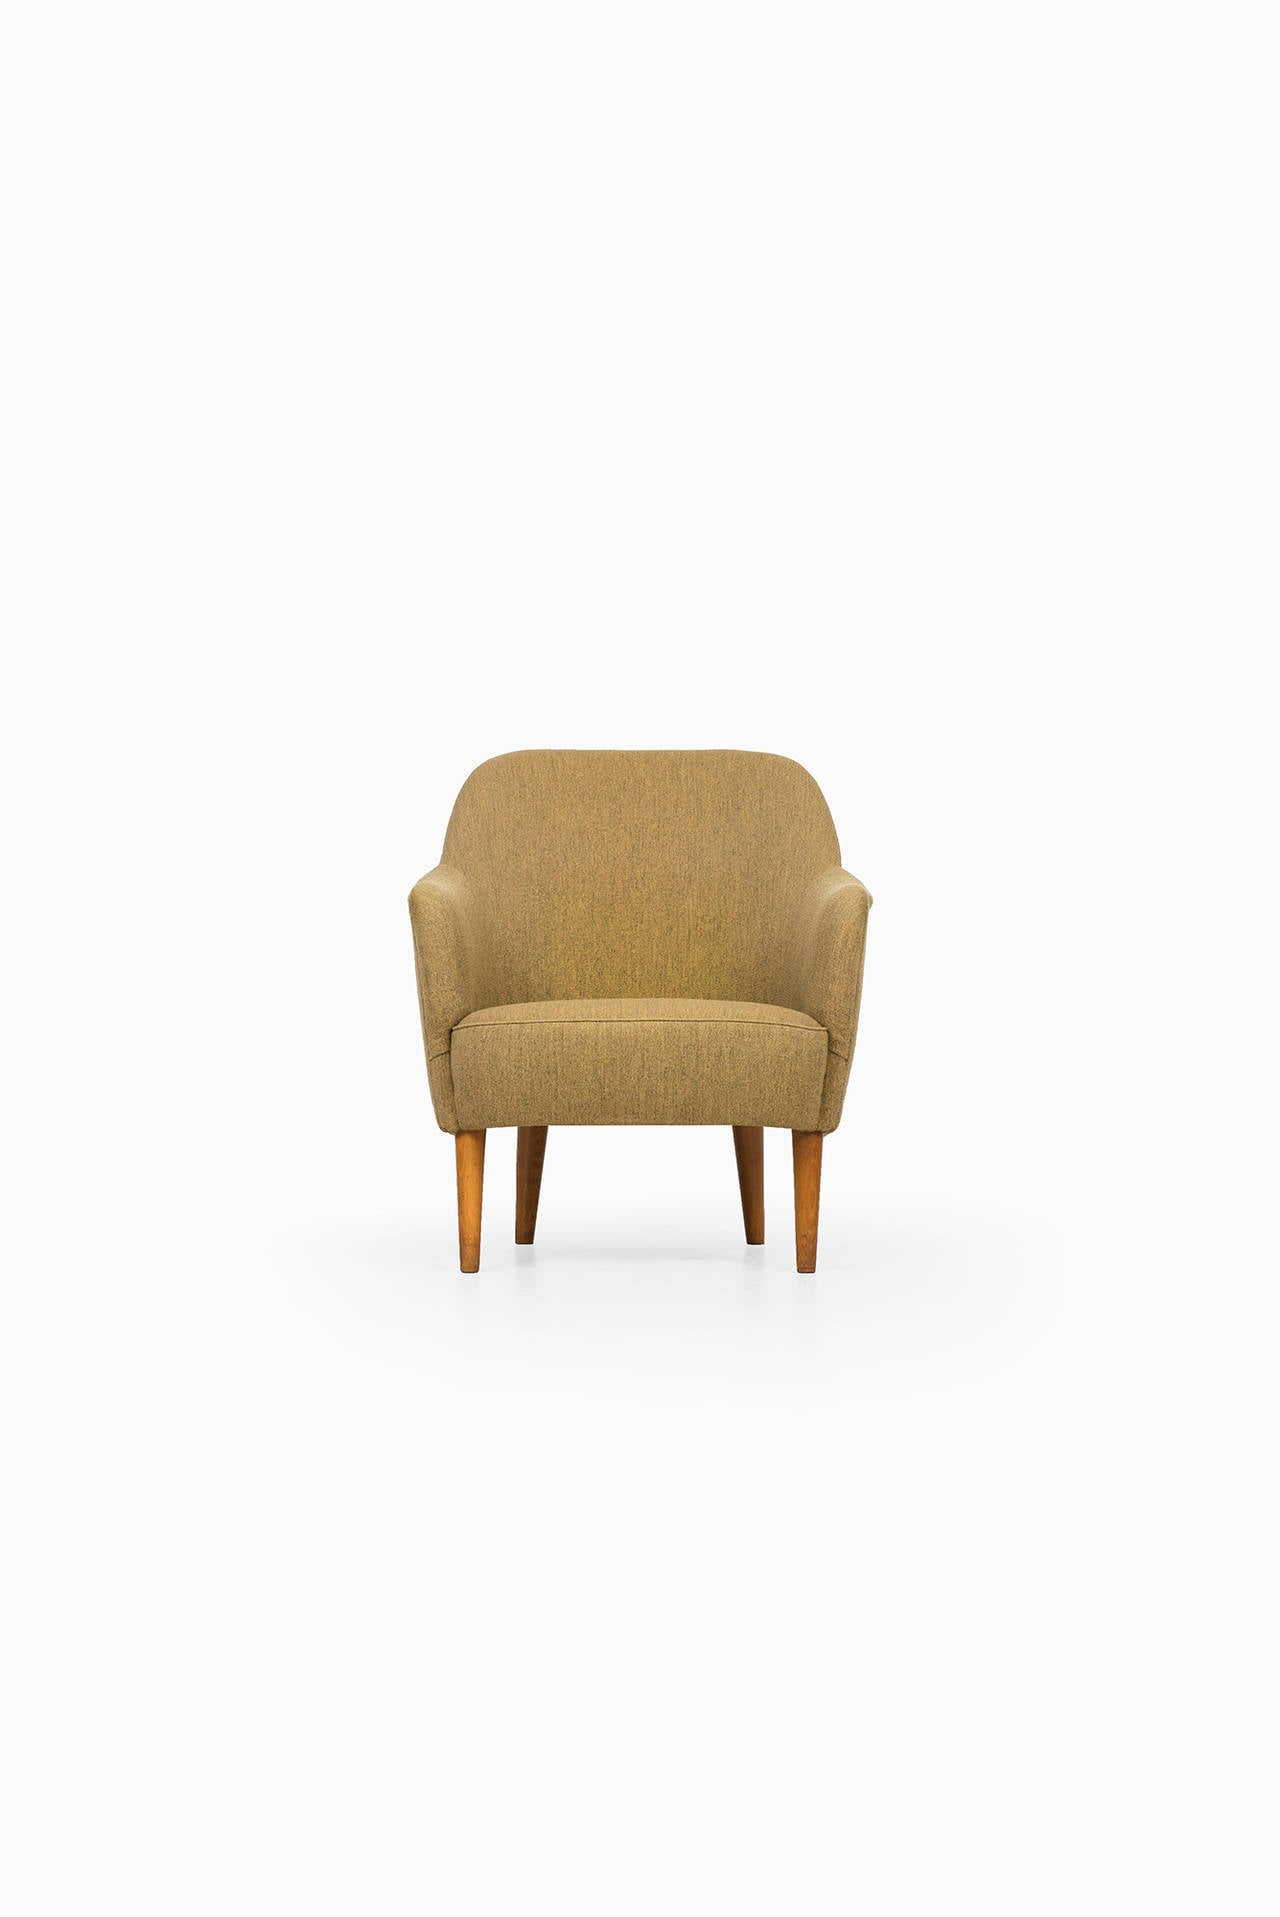 Carl Malmsten Samsas Easy Chair by O H SjöGren in Sweden For Sale